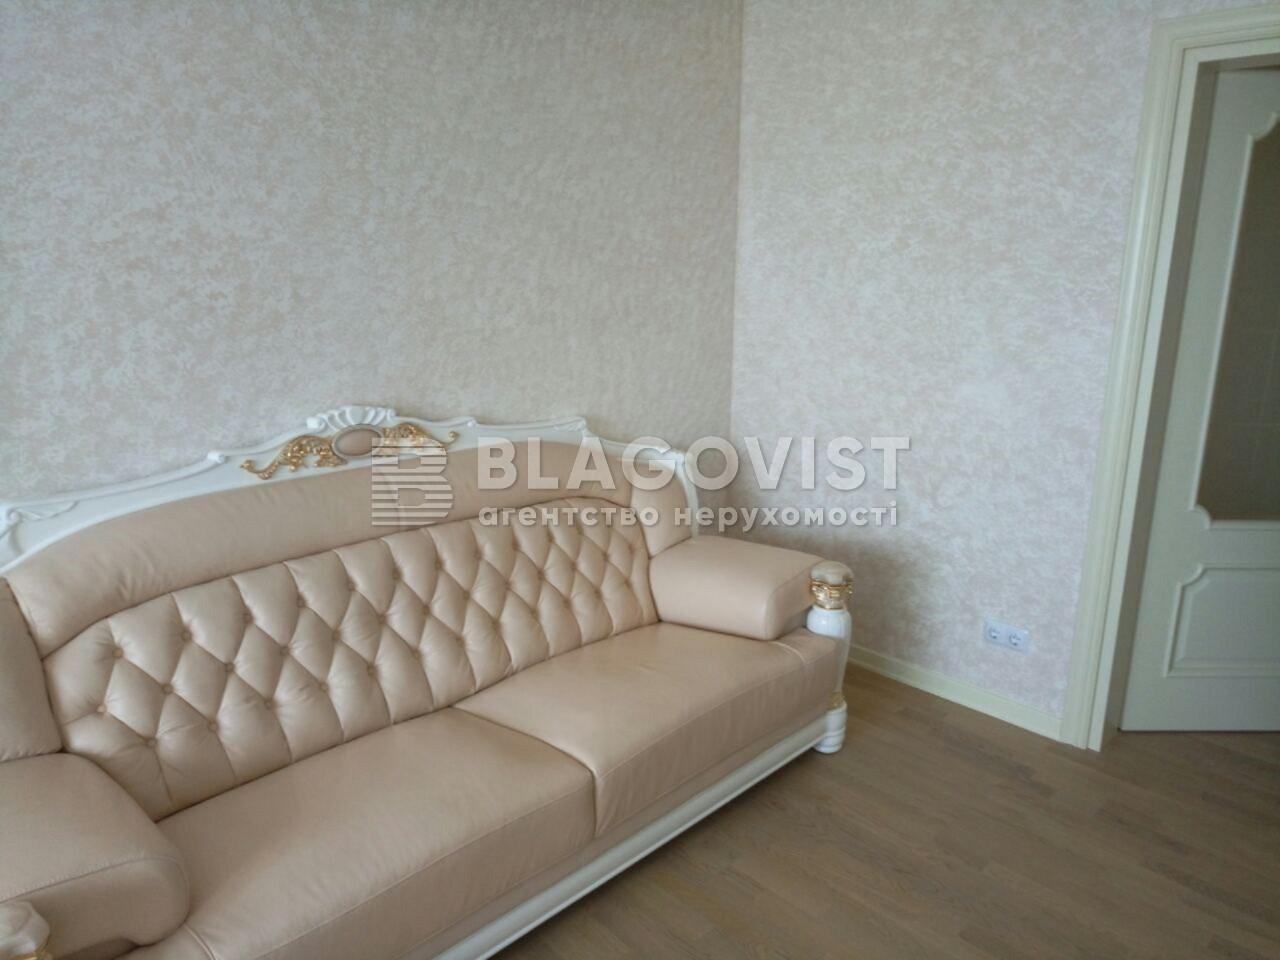 Квартира R-40140, Победы просп., 121б, Киев - Фото 5